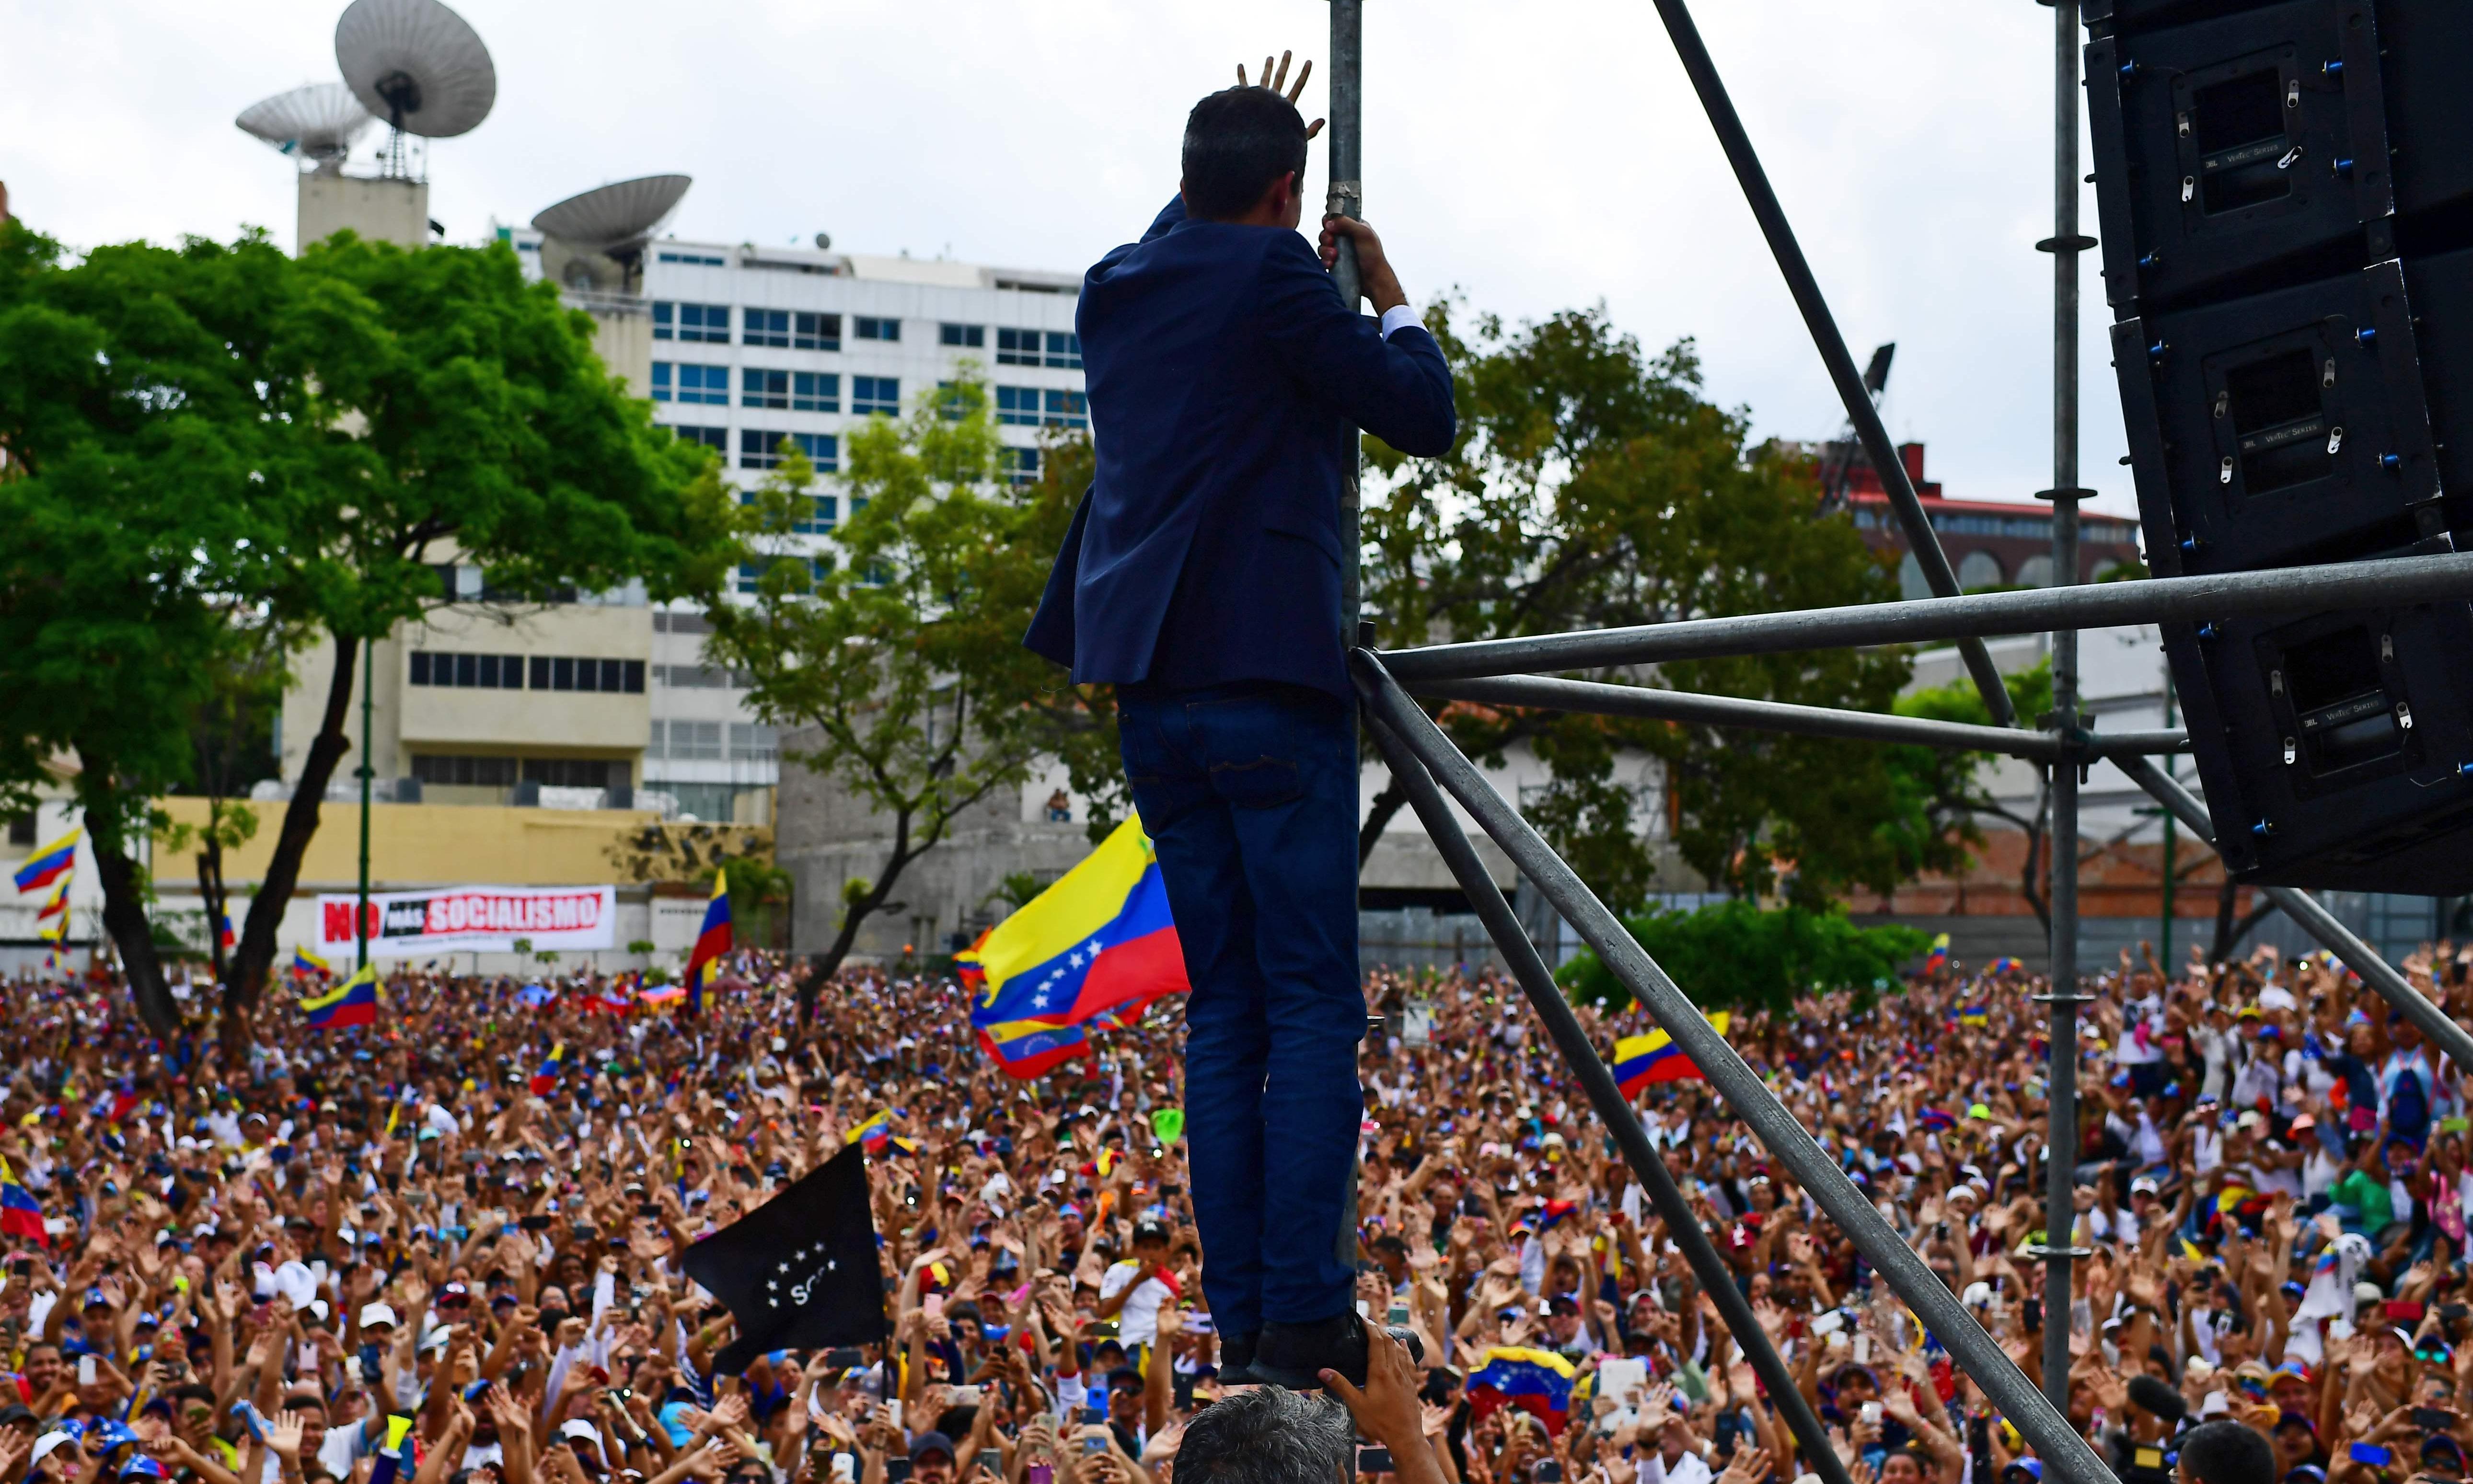 Venezuela's dead revolution shows the limitations of the crowd